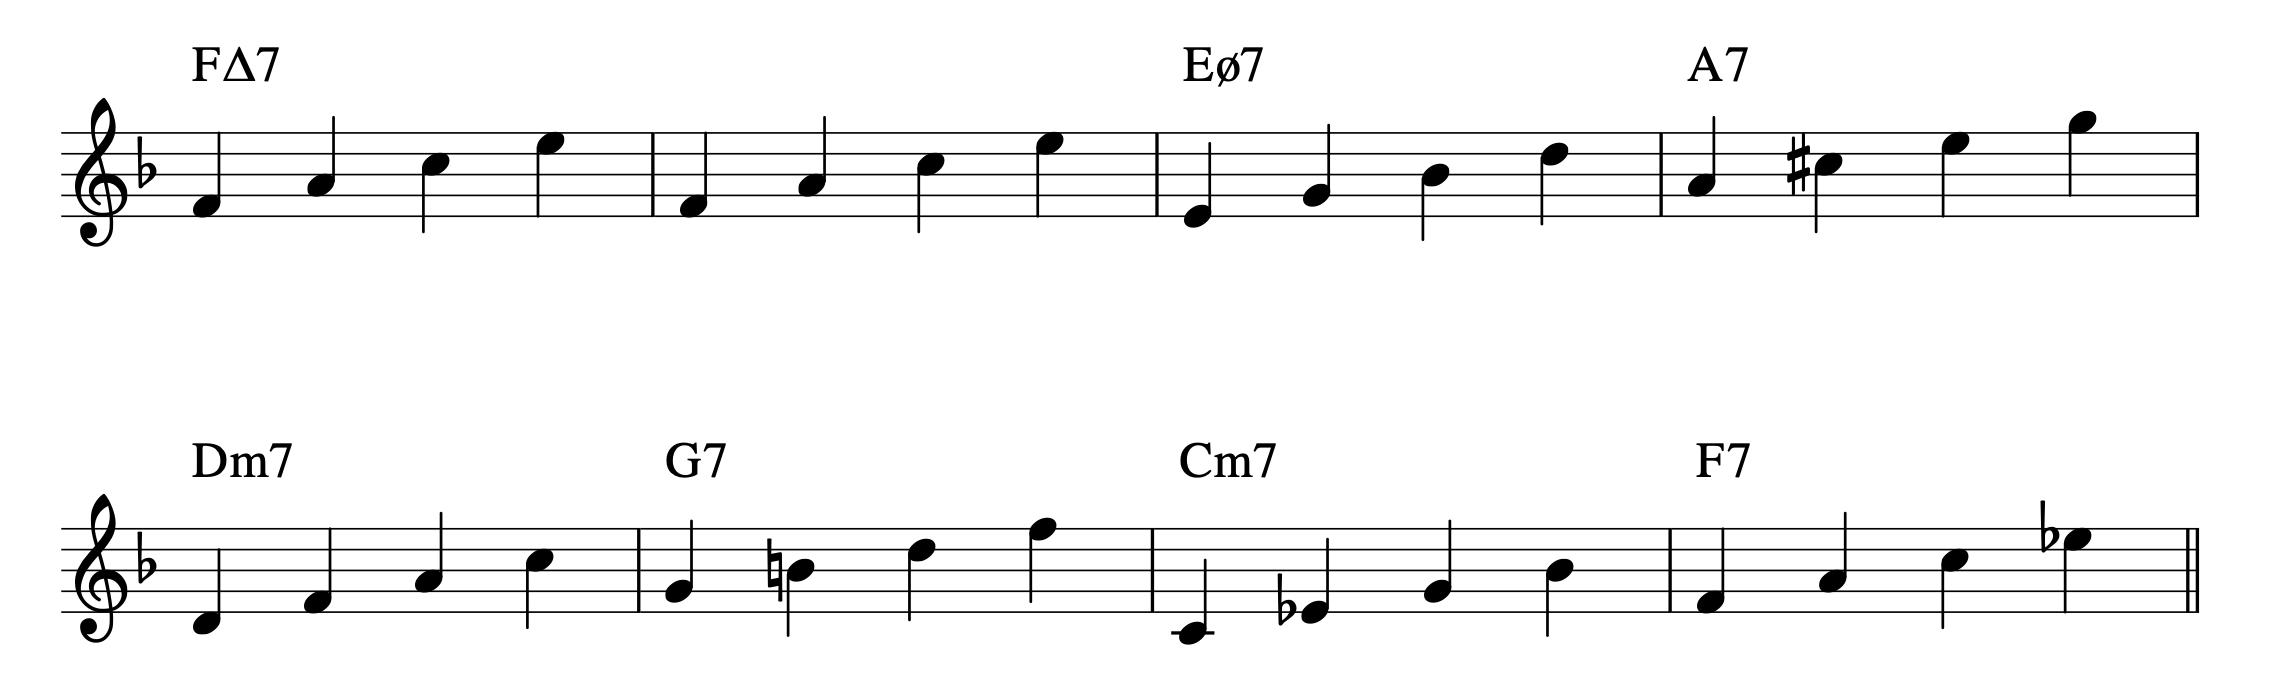 chords-tone-2